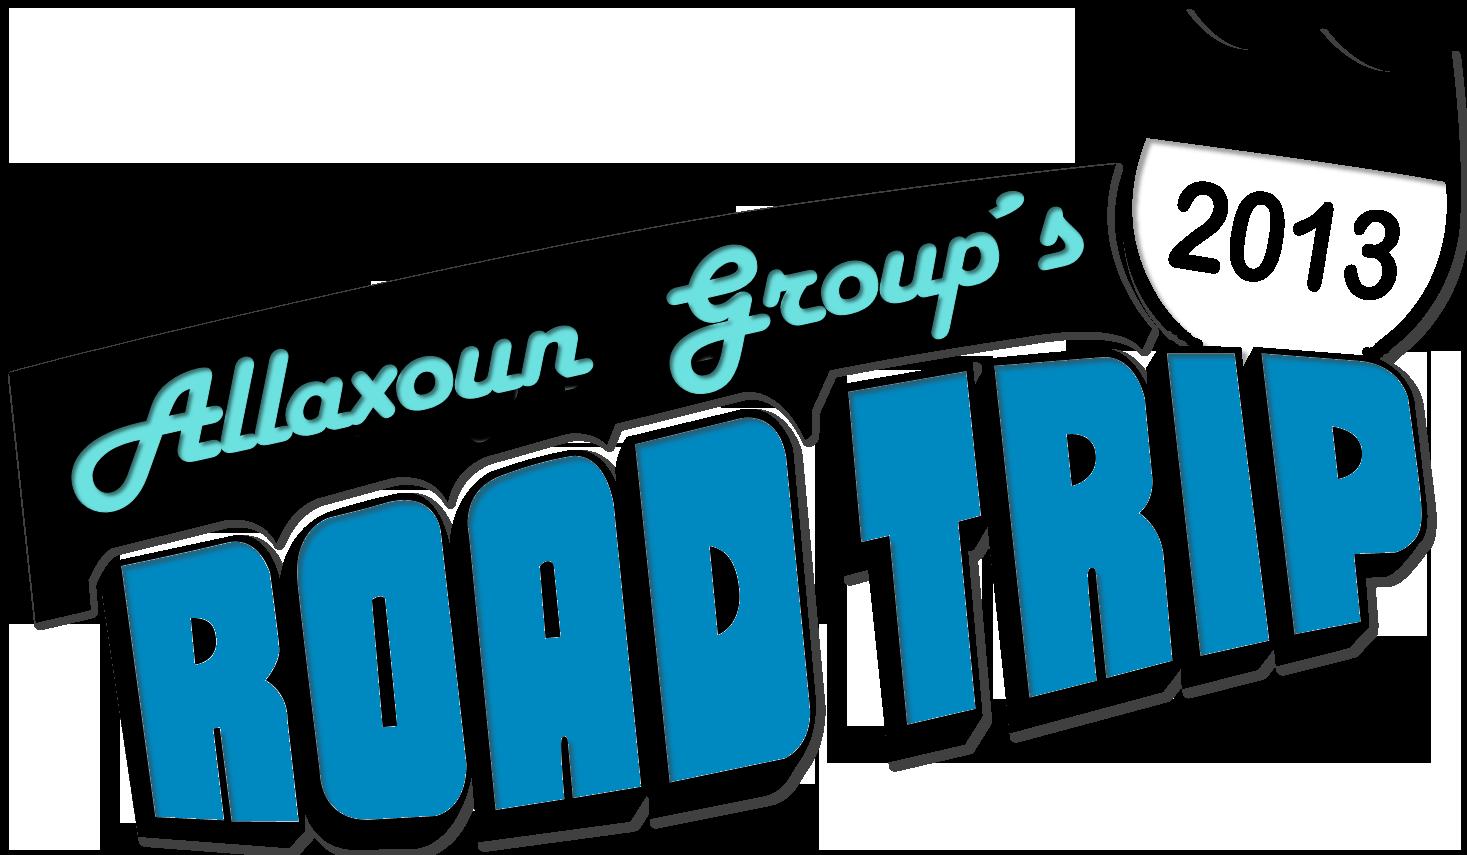 Road Trip Clipart - Cliparts.co